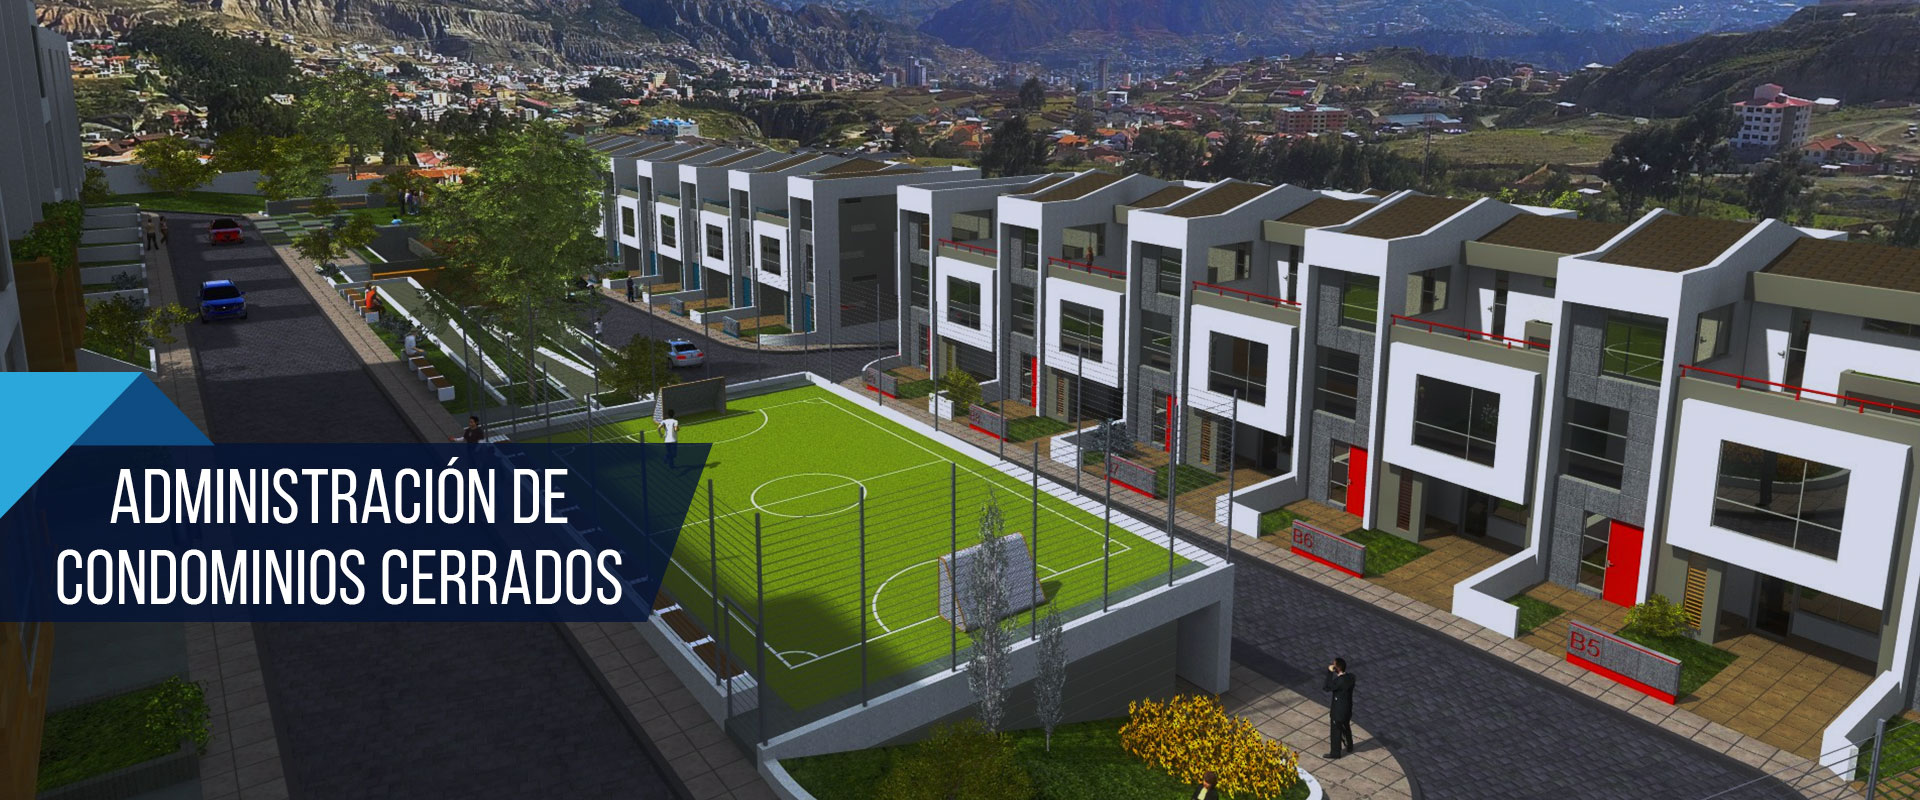 administracion-de-condominios